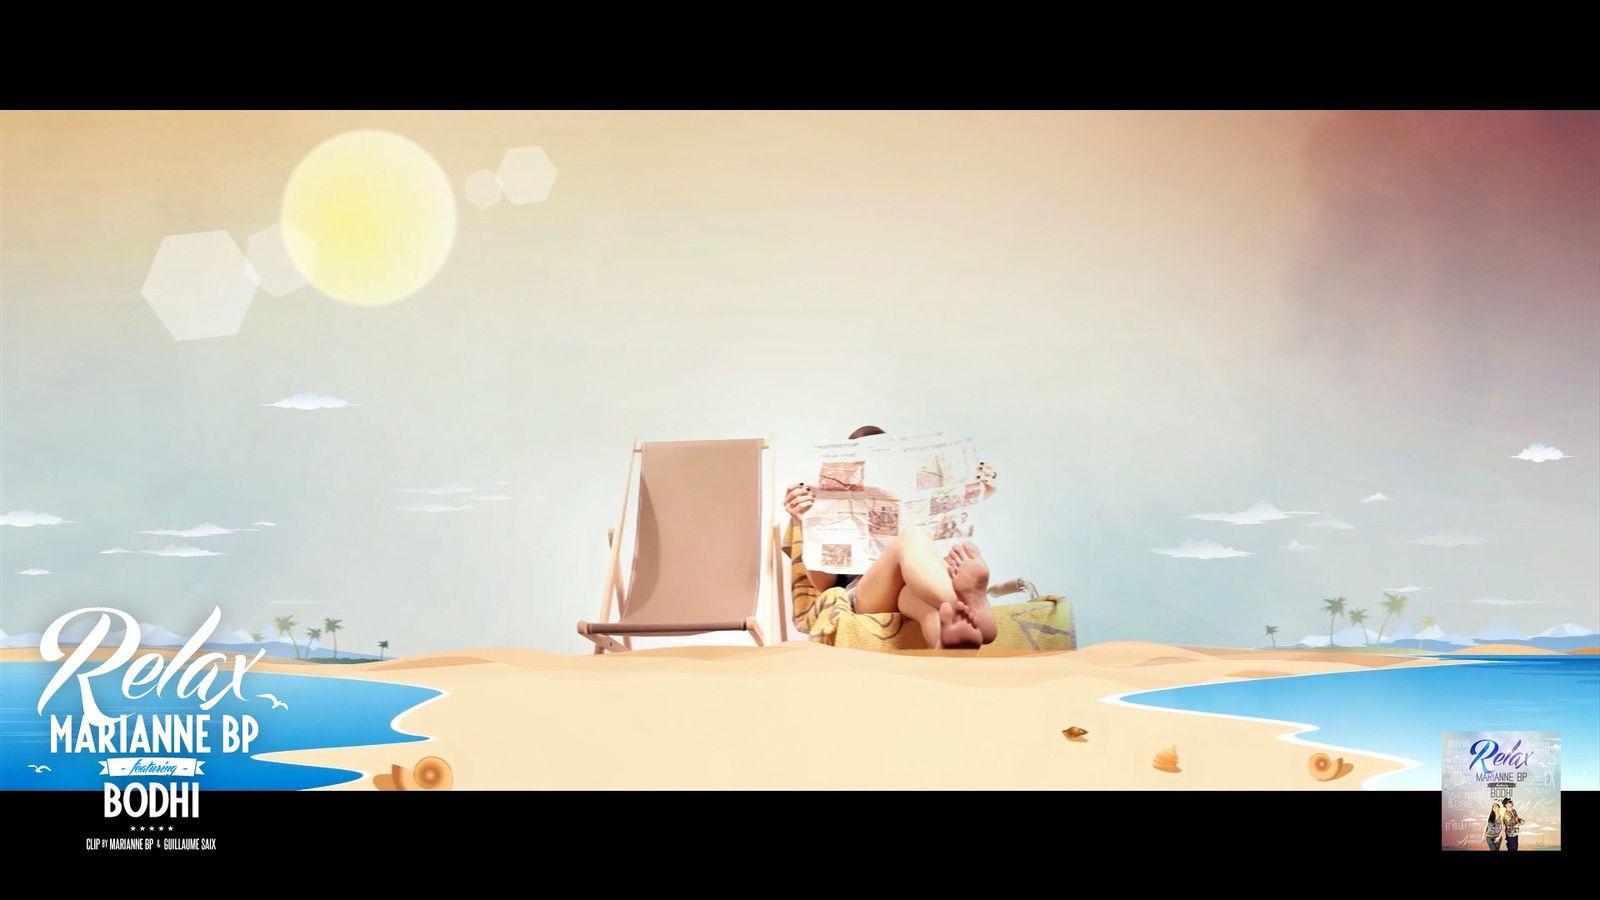 Clip &amp&#x3B; Artwork &quot&#x3B;Relax&quot&#x3B; Marianne BP feat. Bodhi